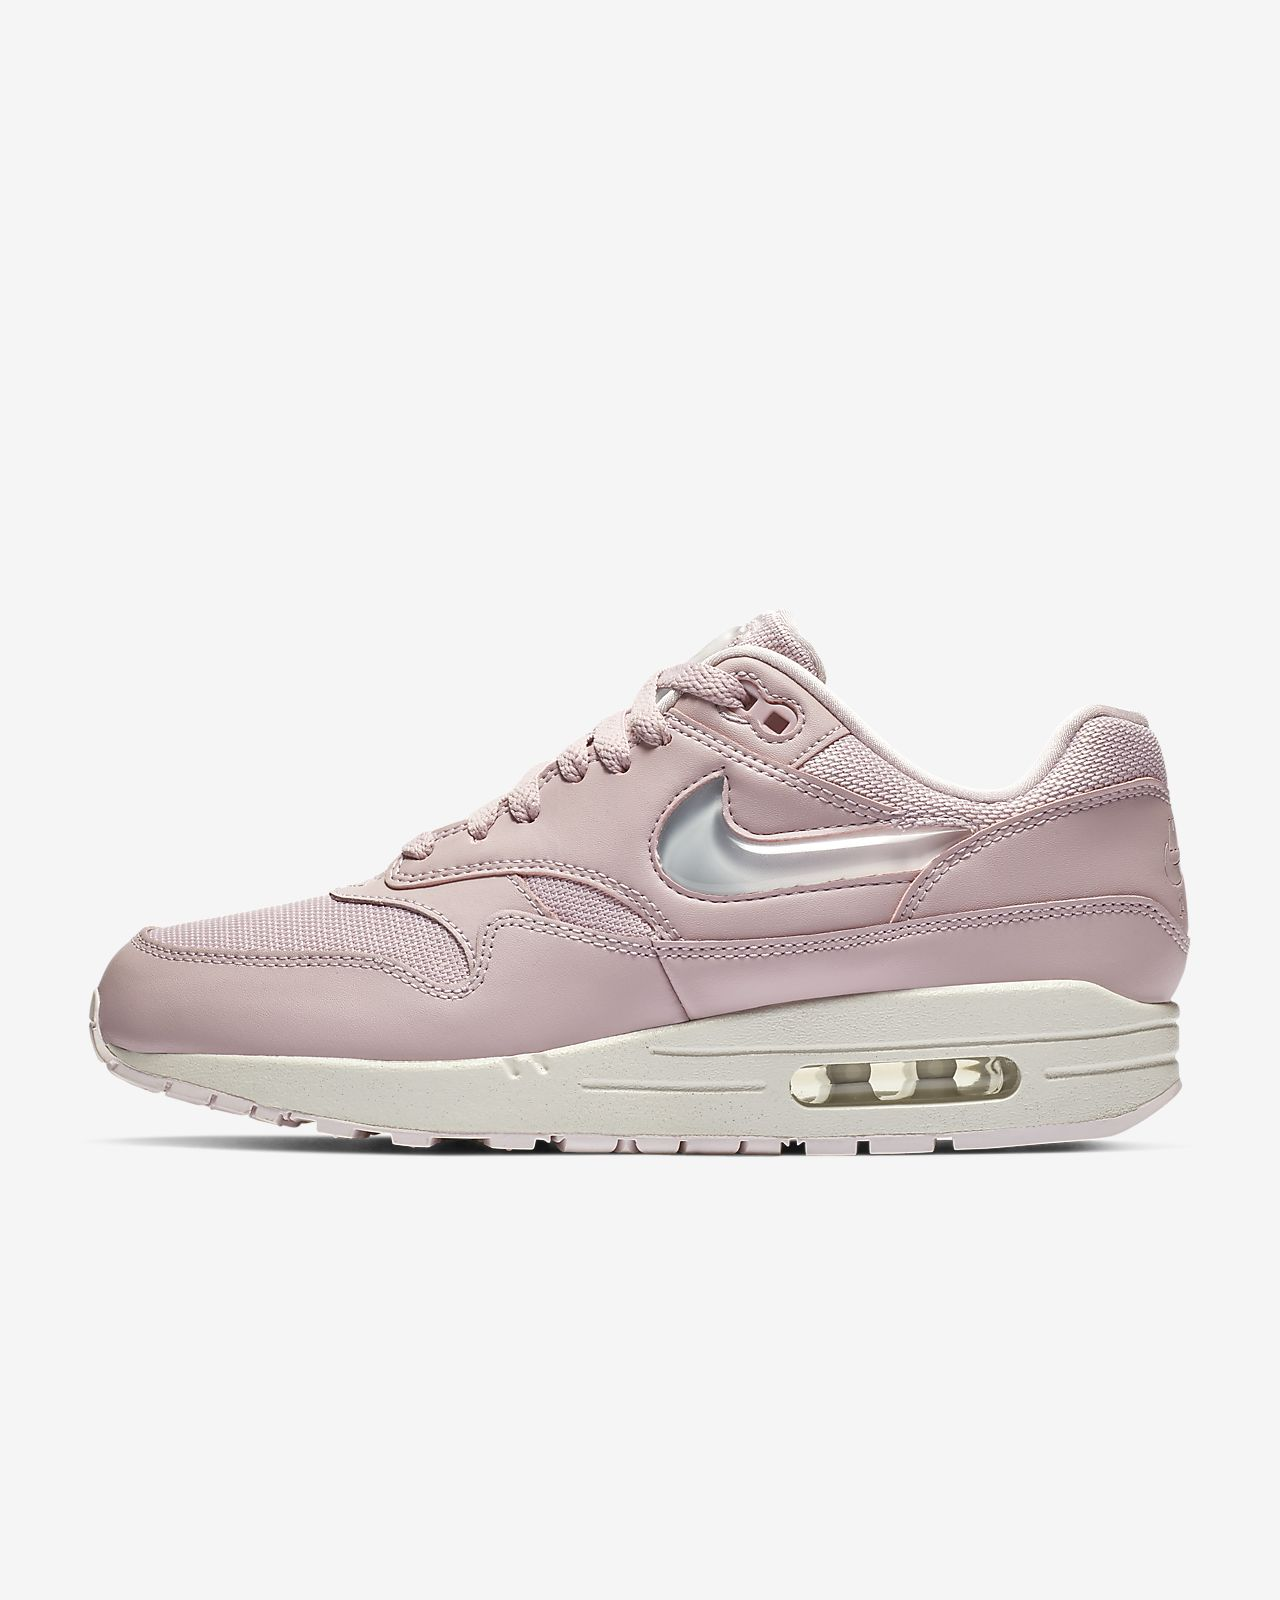 lowest price 2aab2 849a1 Nike Air Max 1 Premium